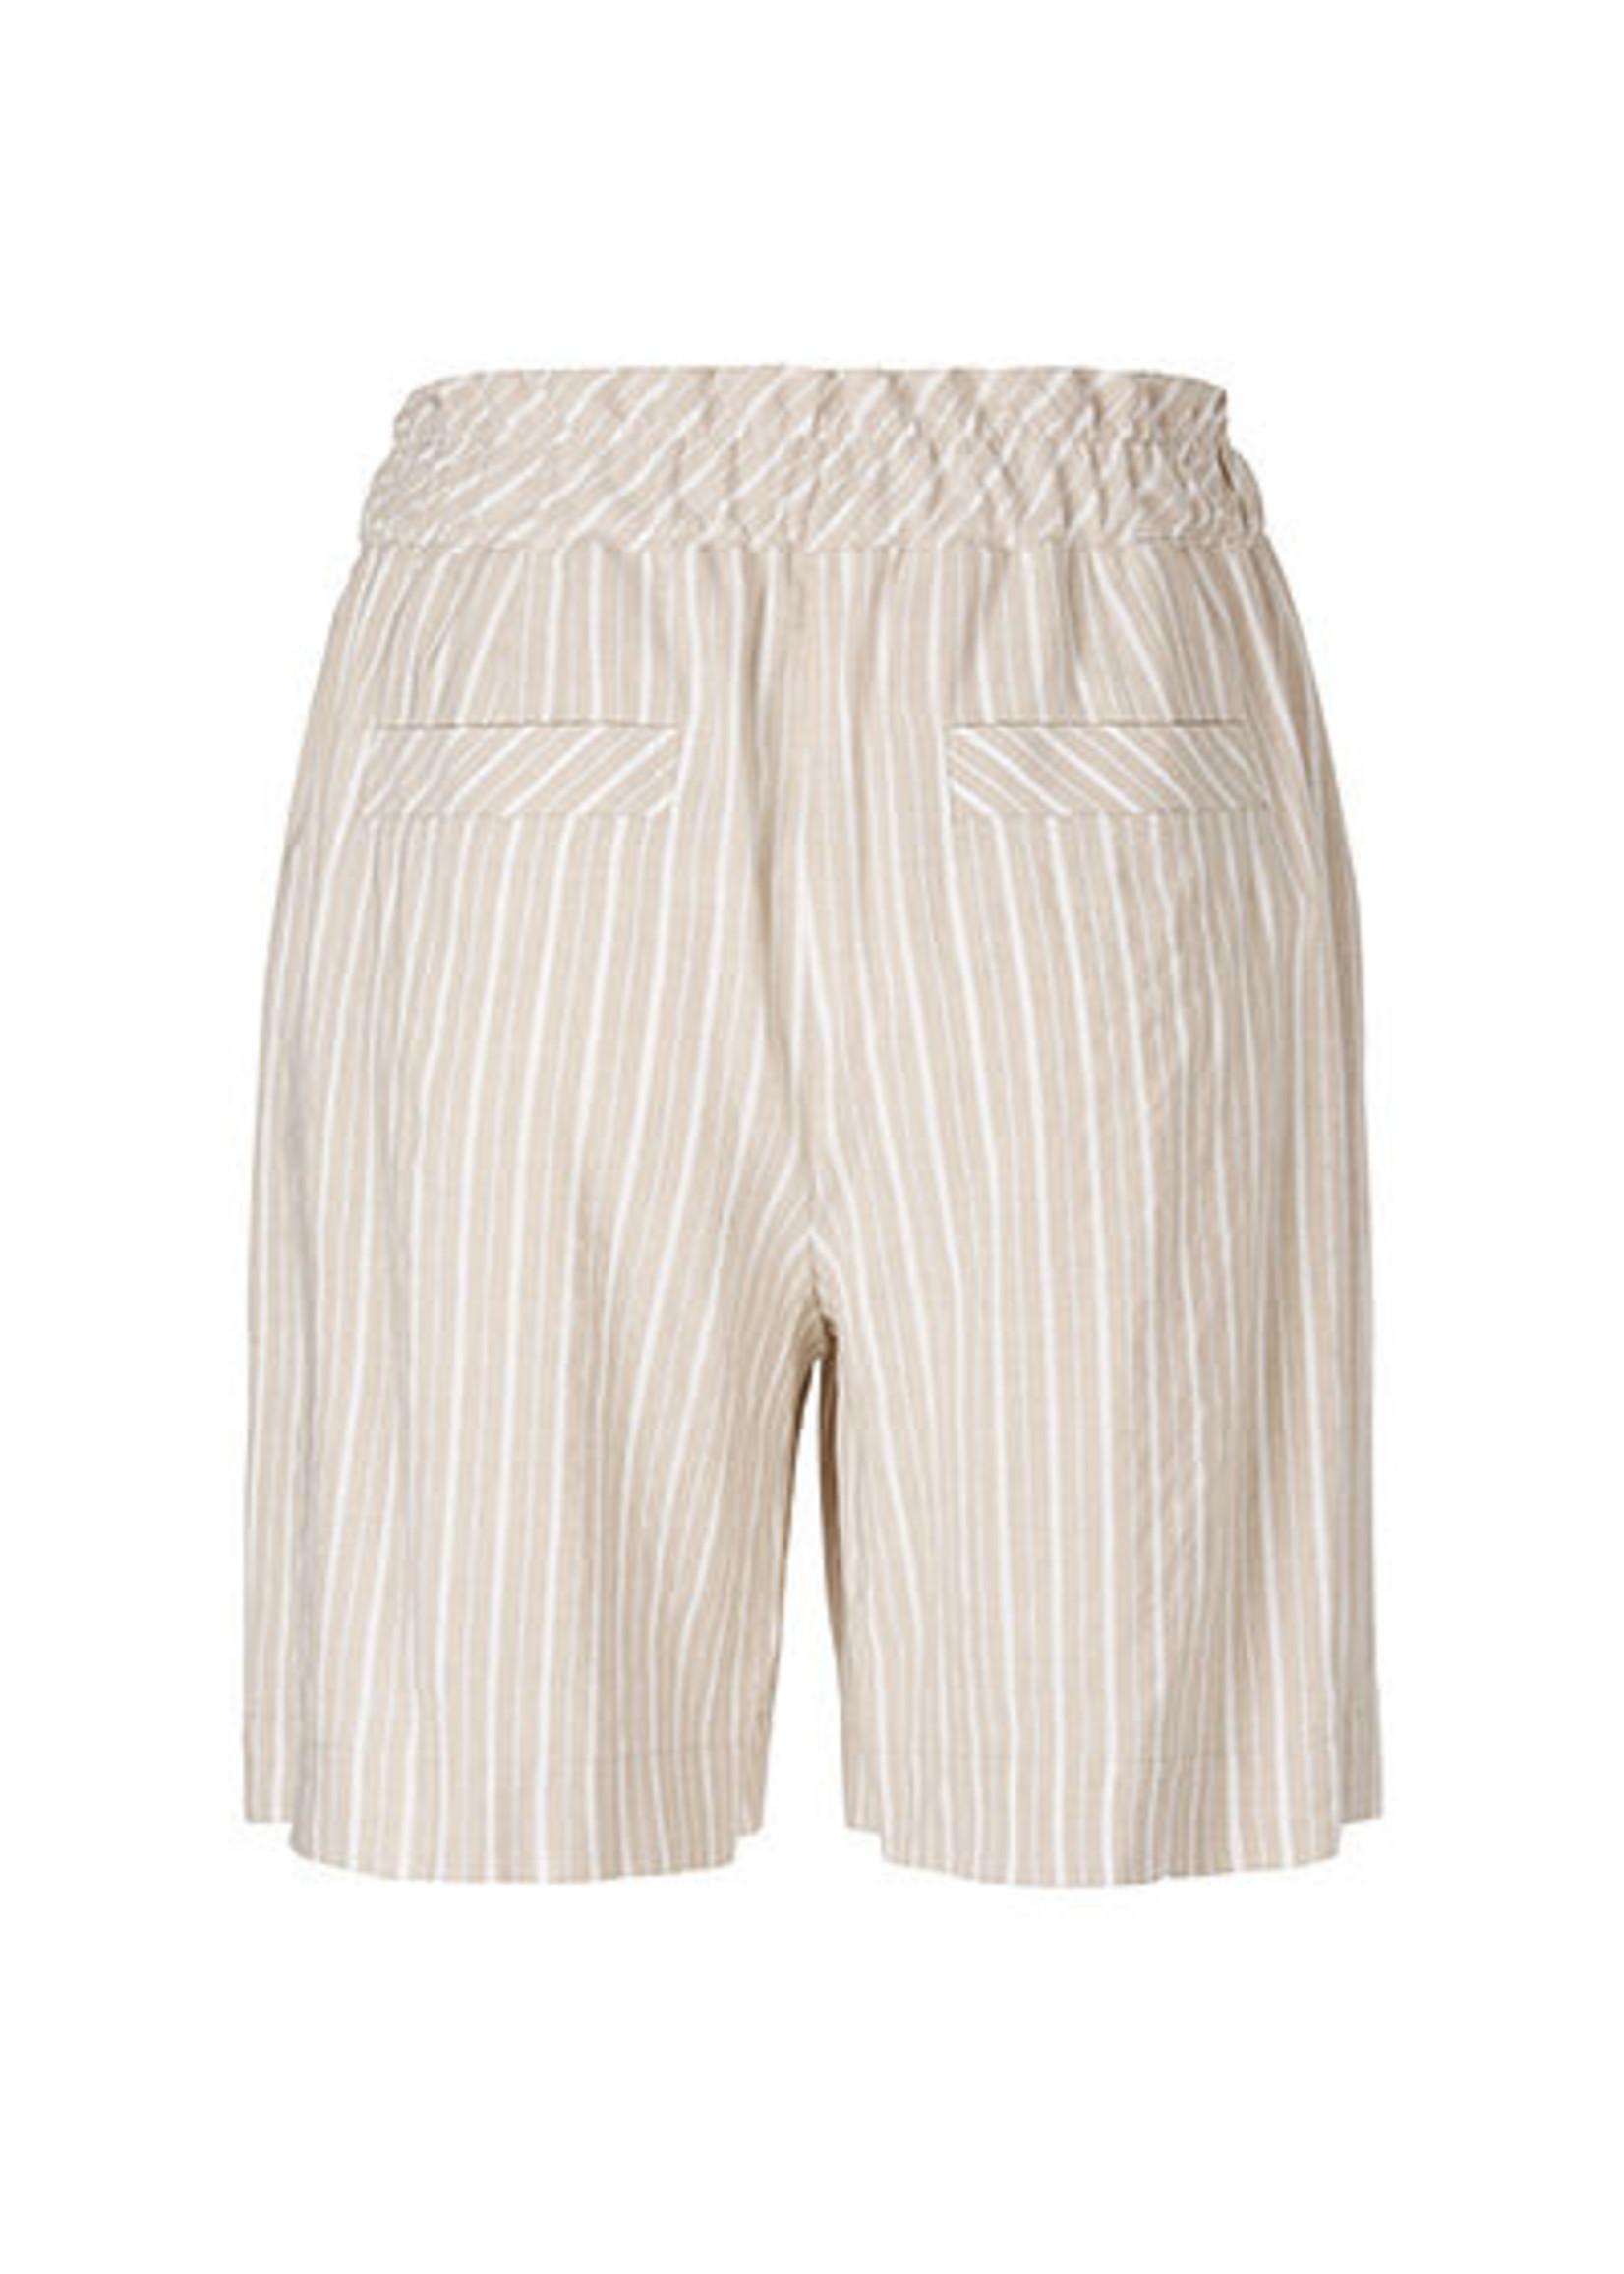 Shorts QC 83.07 W77